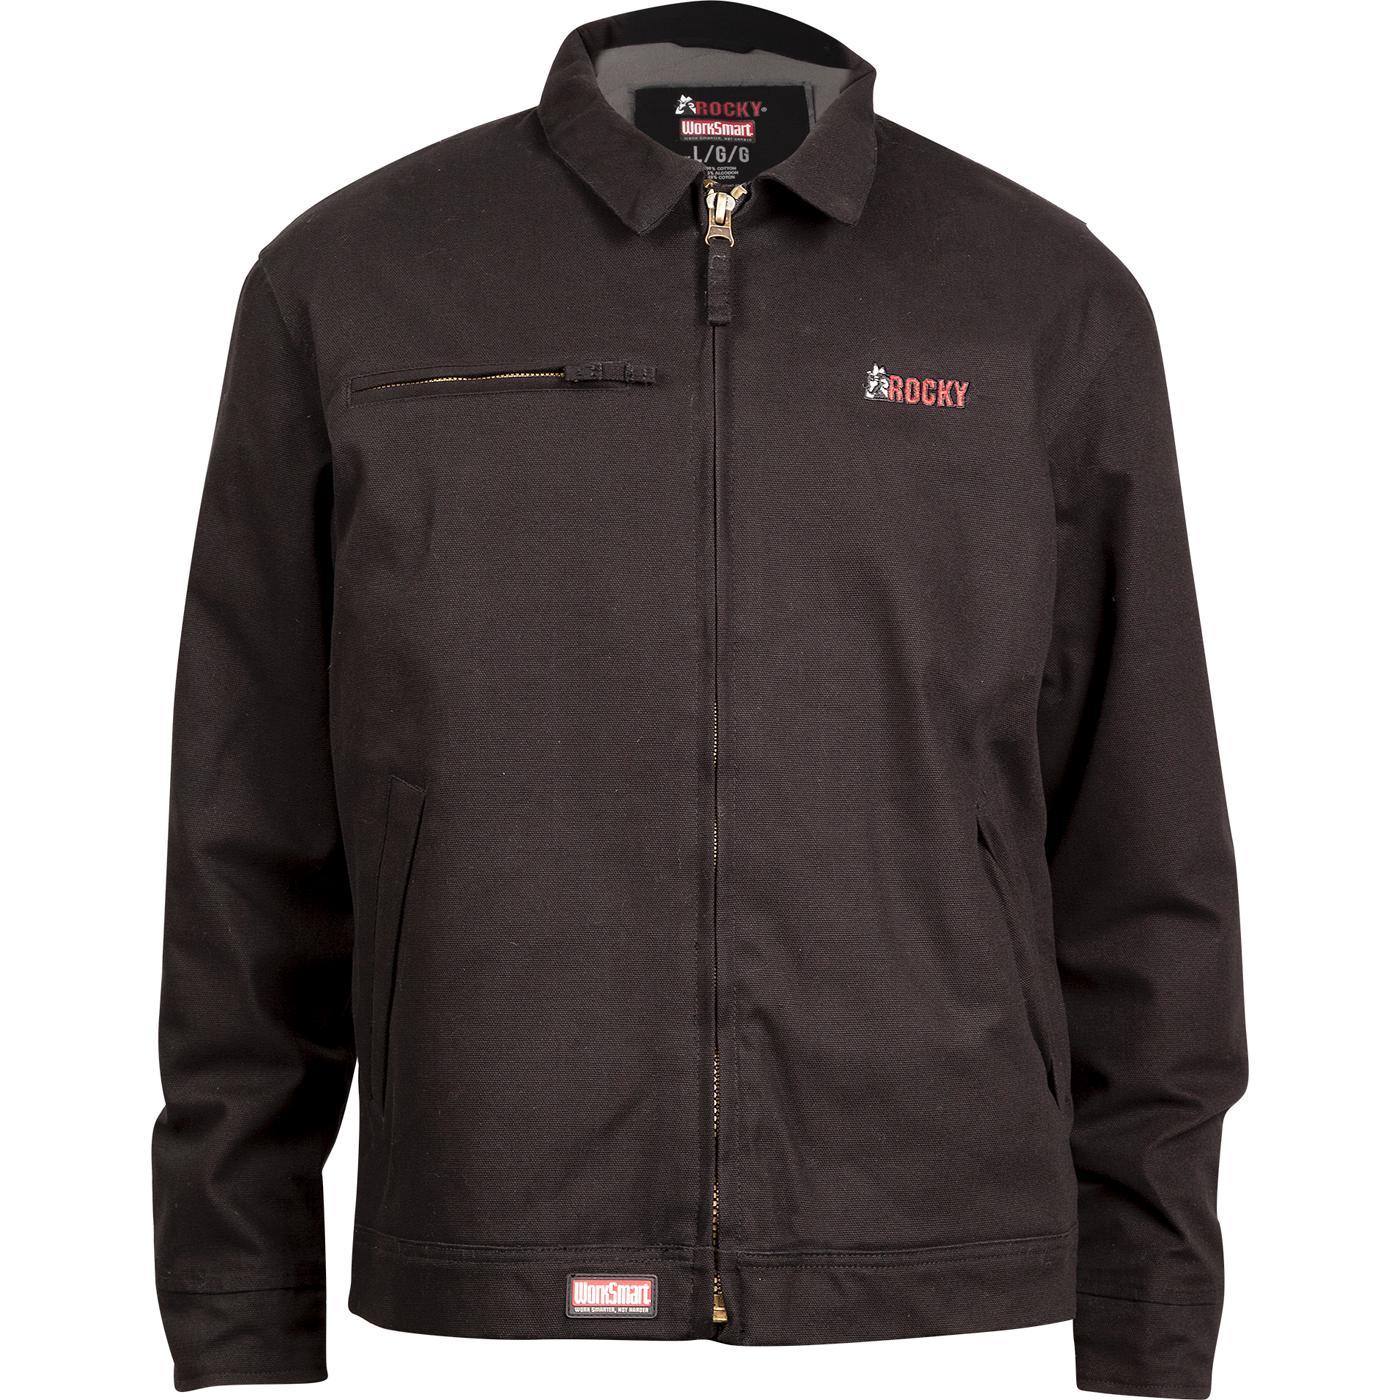 Rocky Worksmart Waterproof Insulated Work Jacket Ww00001